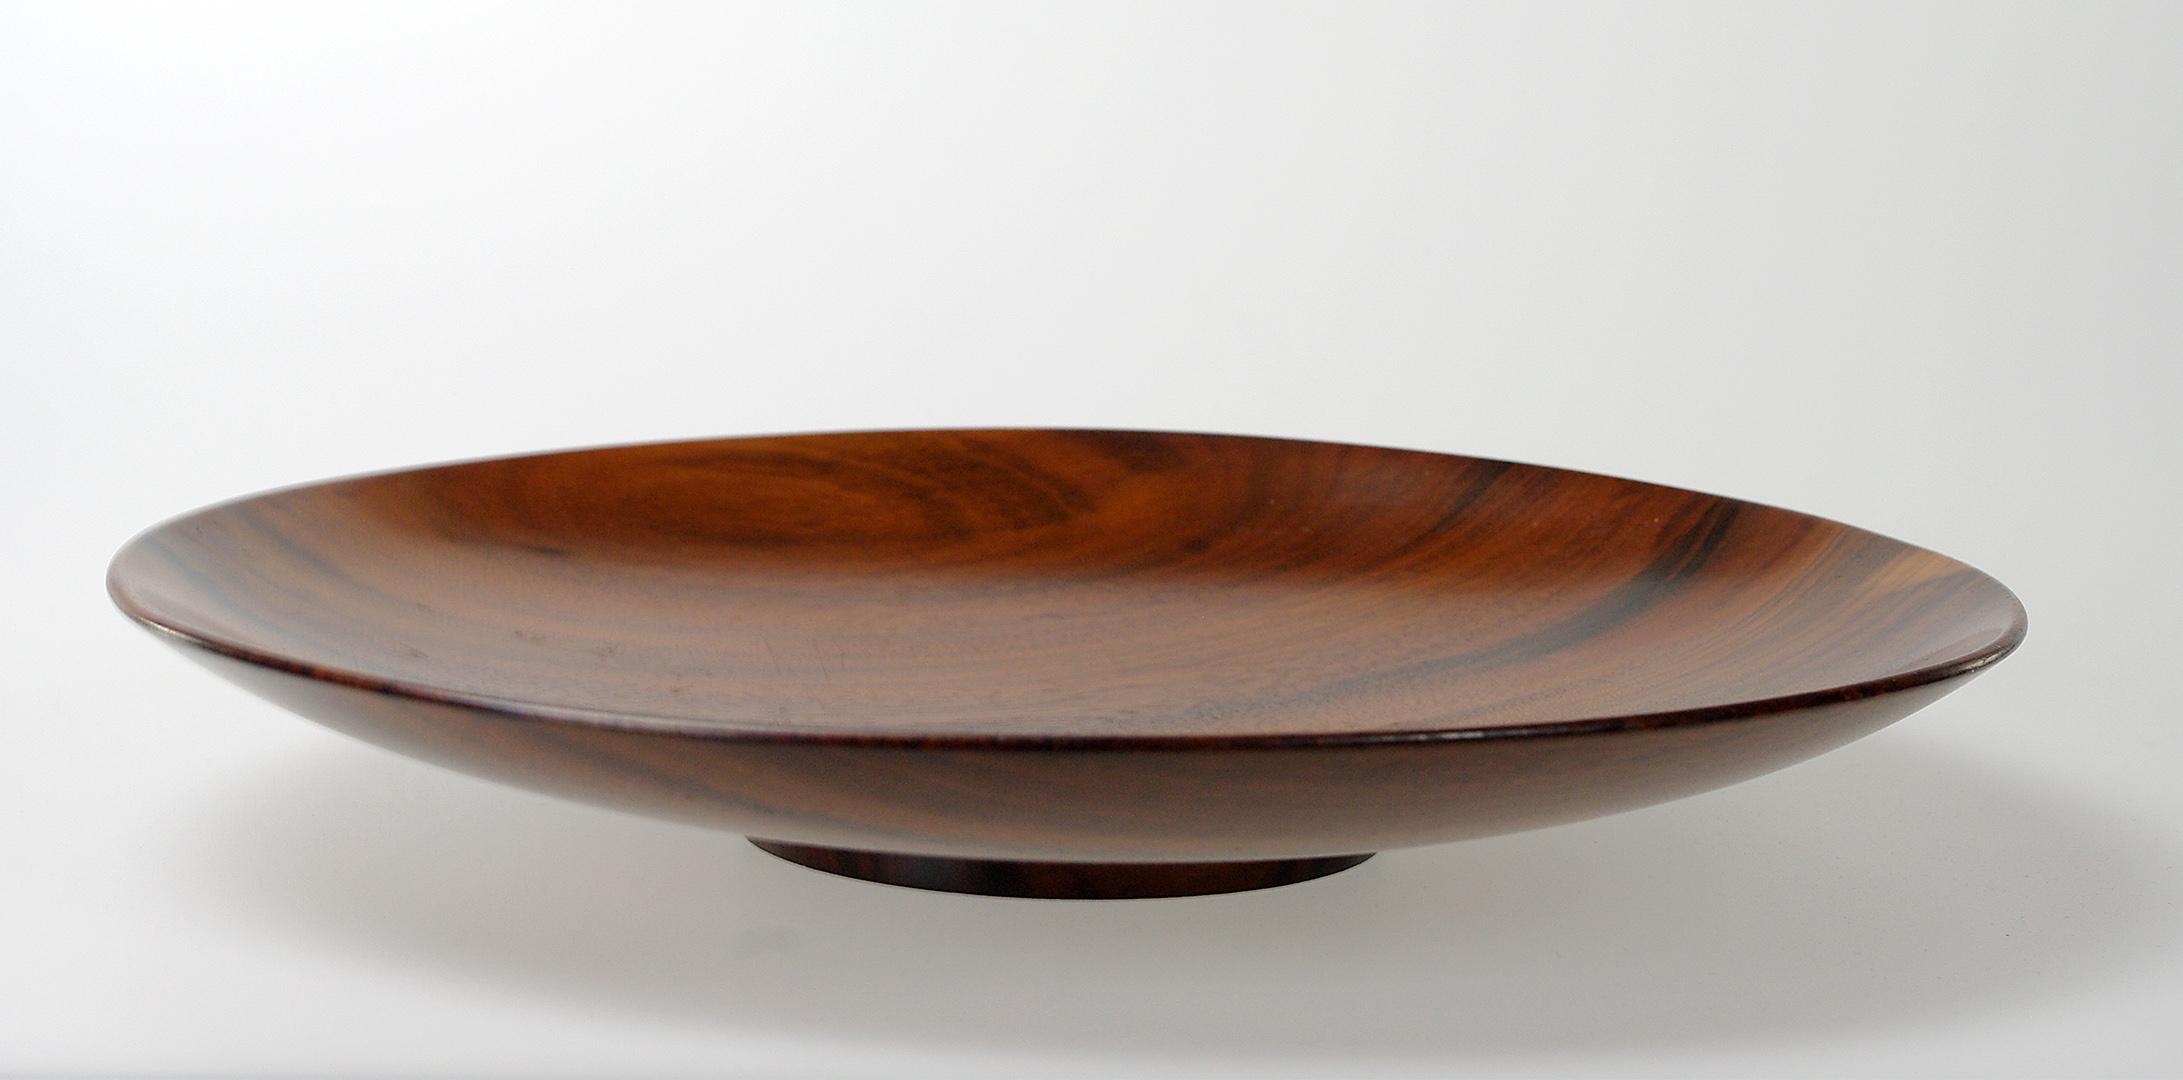 stocksdale-bowl-side-1.jpg